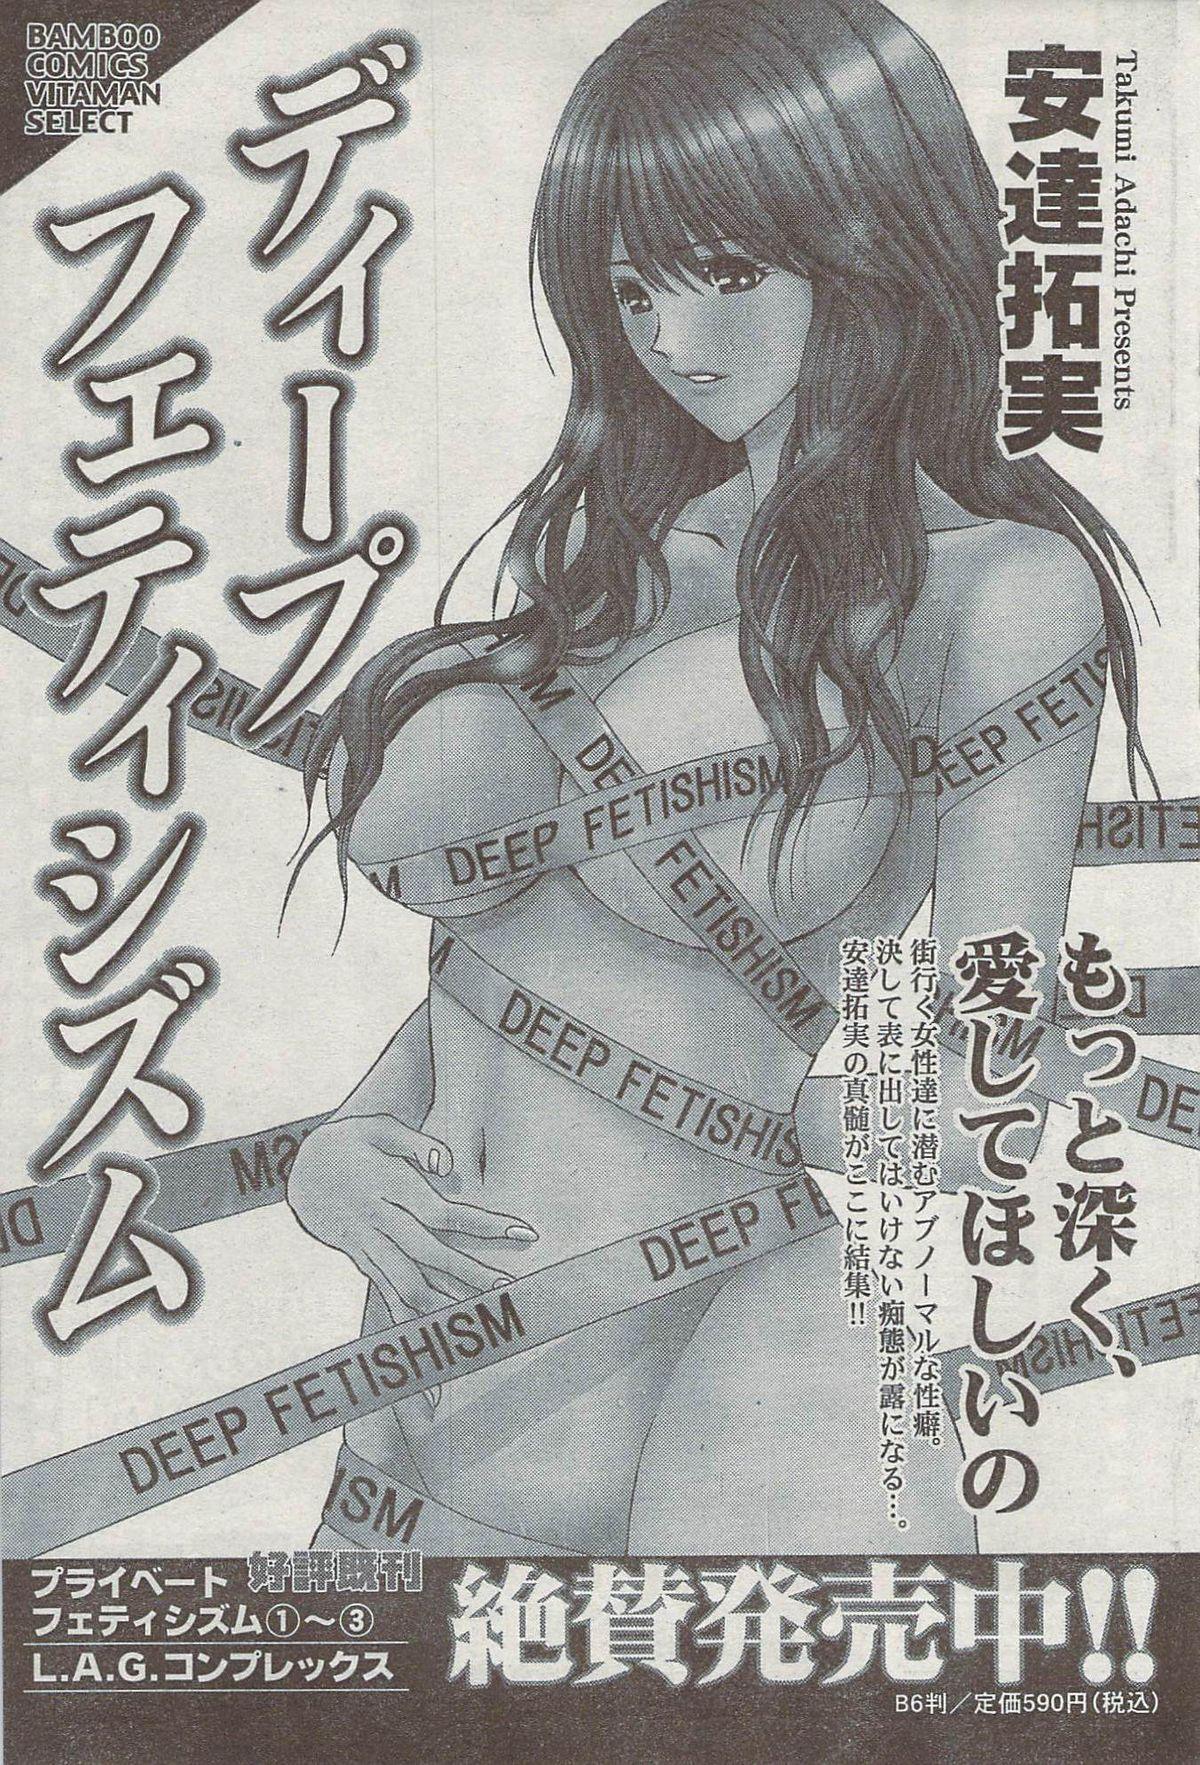 Monthly Vitaman 2007-08 90